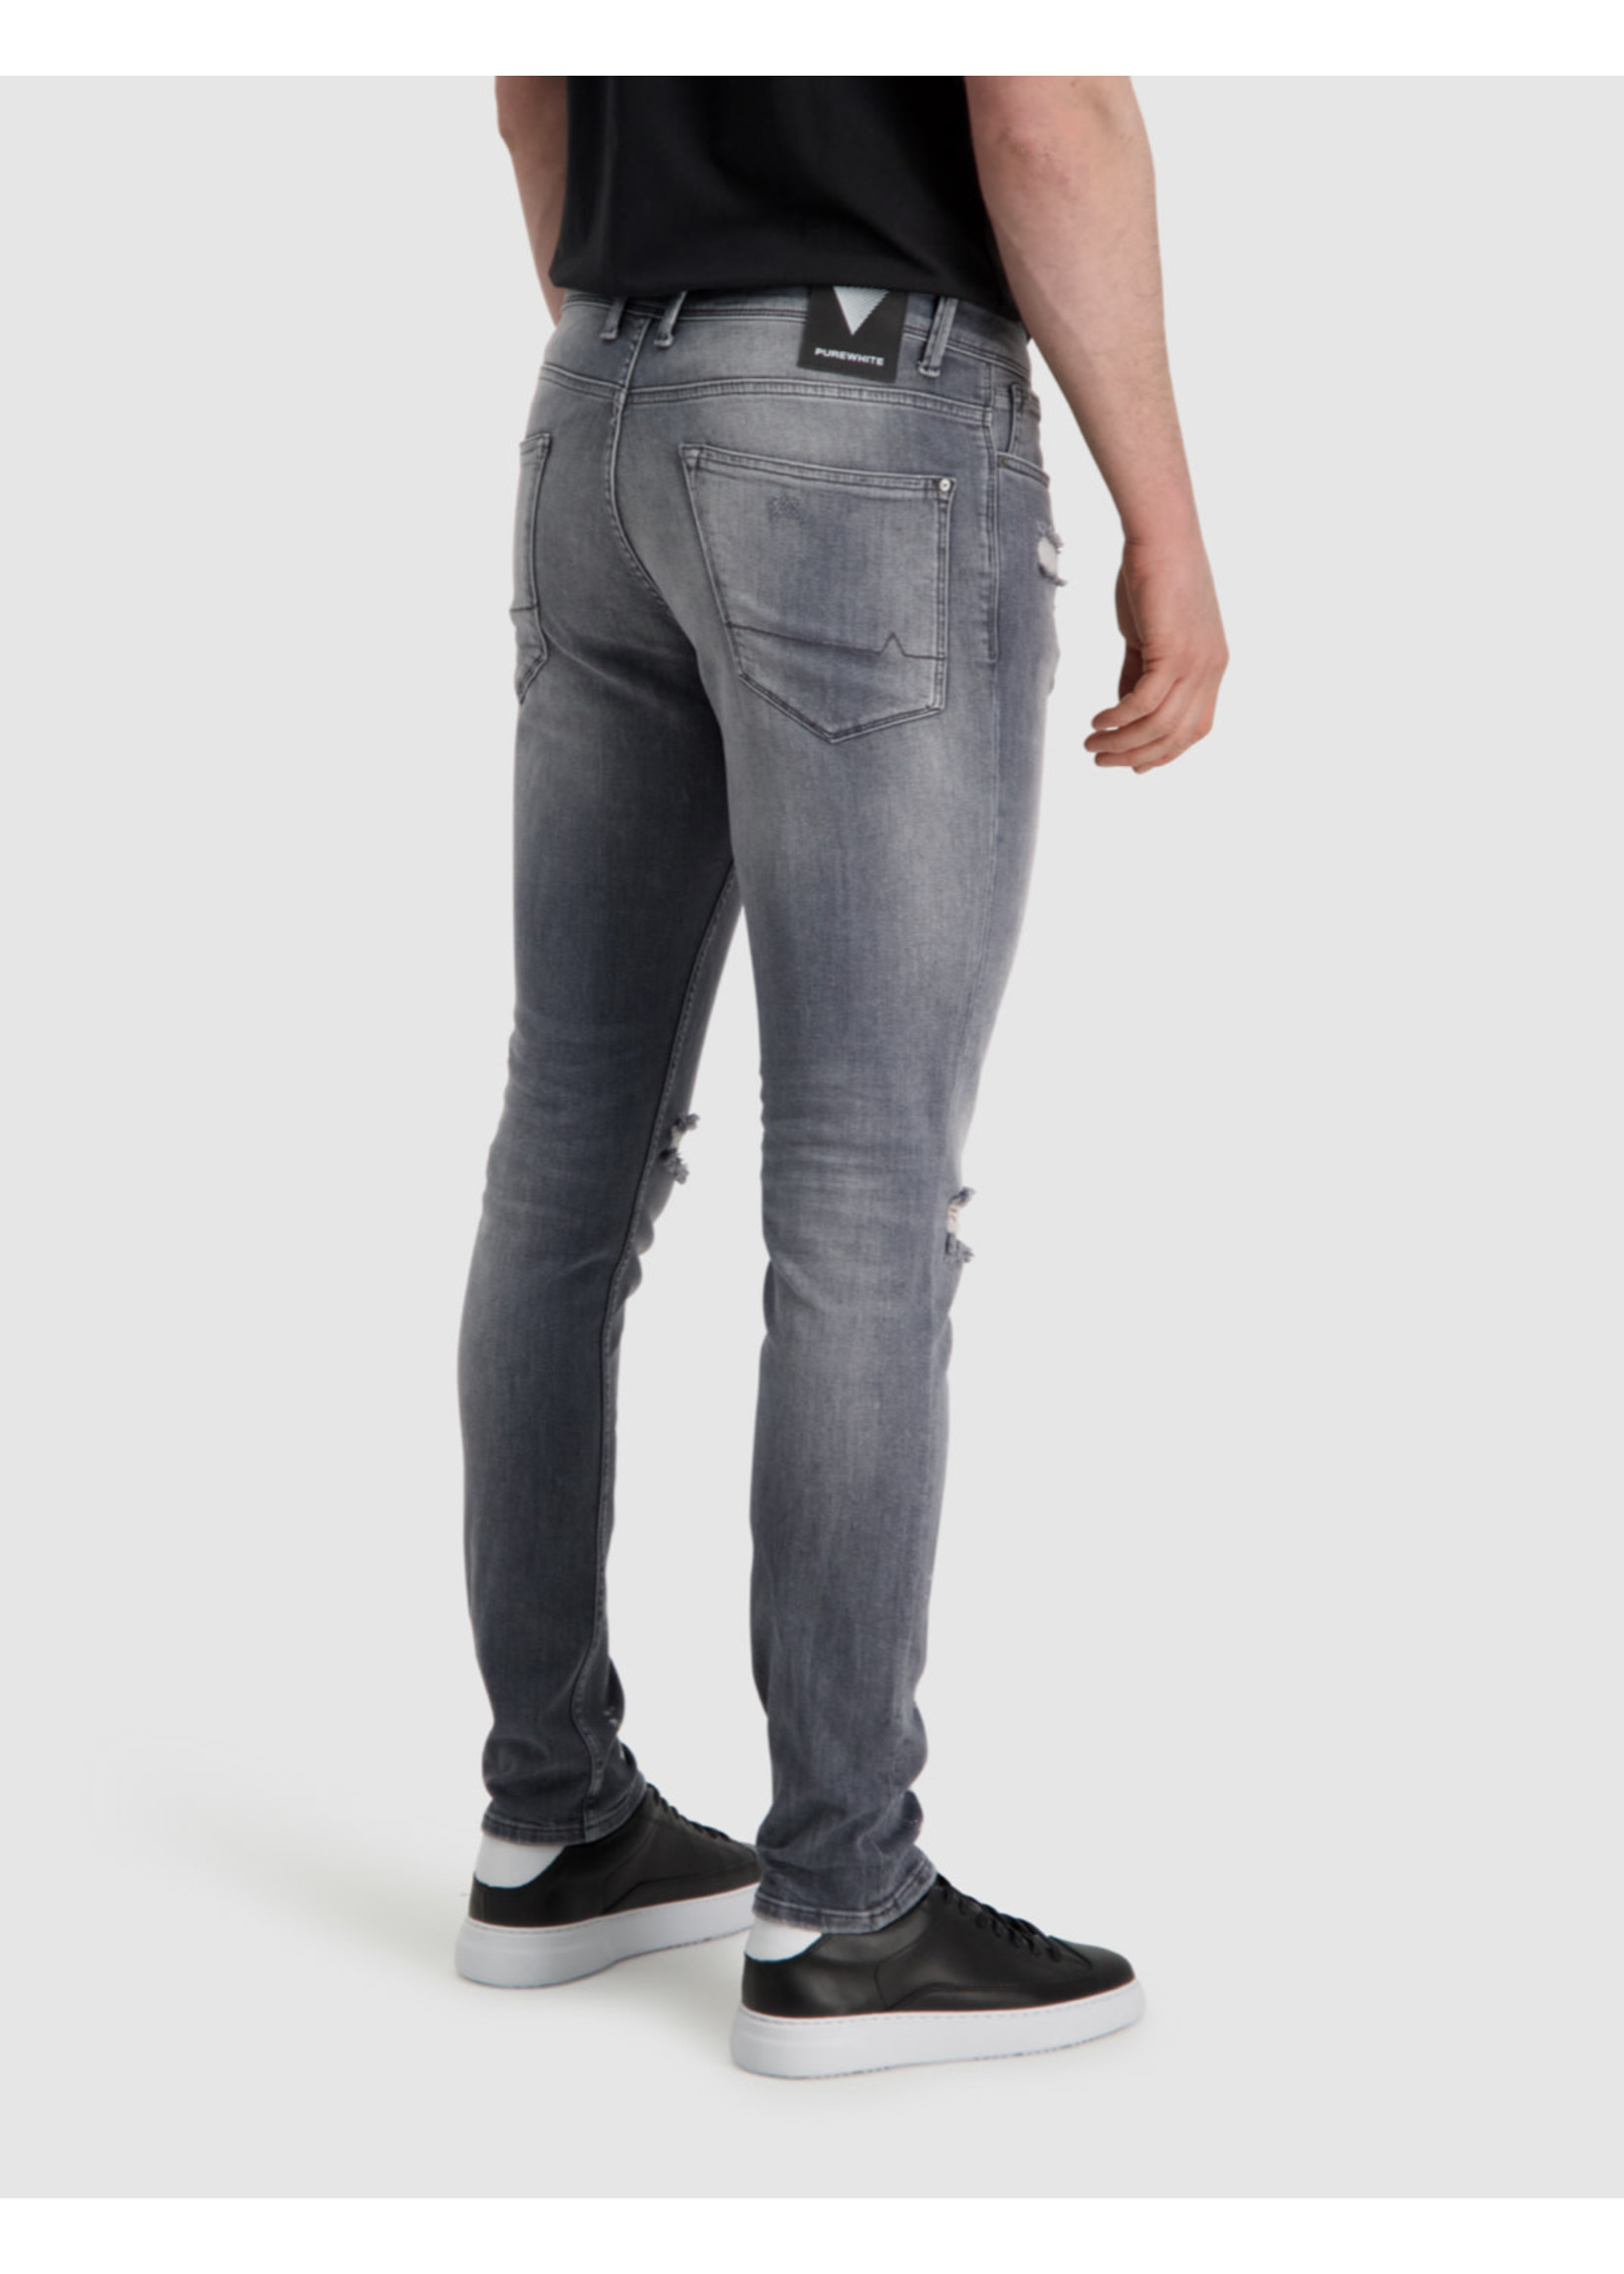 Purewhite Purewhite Jeans The Jone 0392 Damaged - Grey